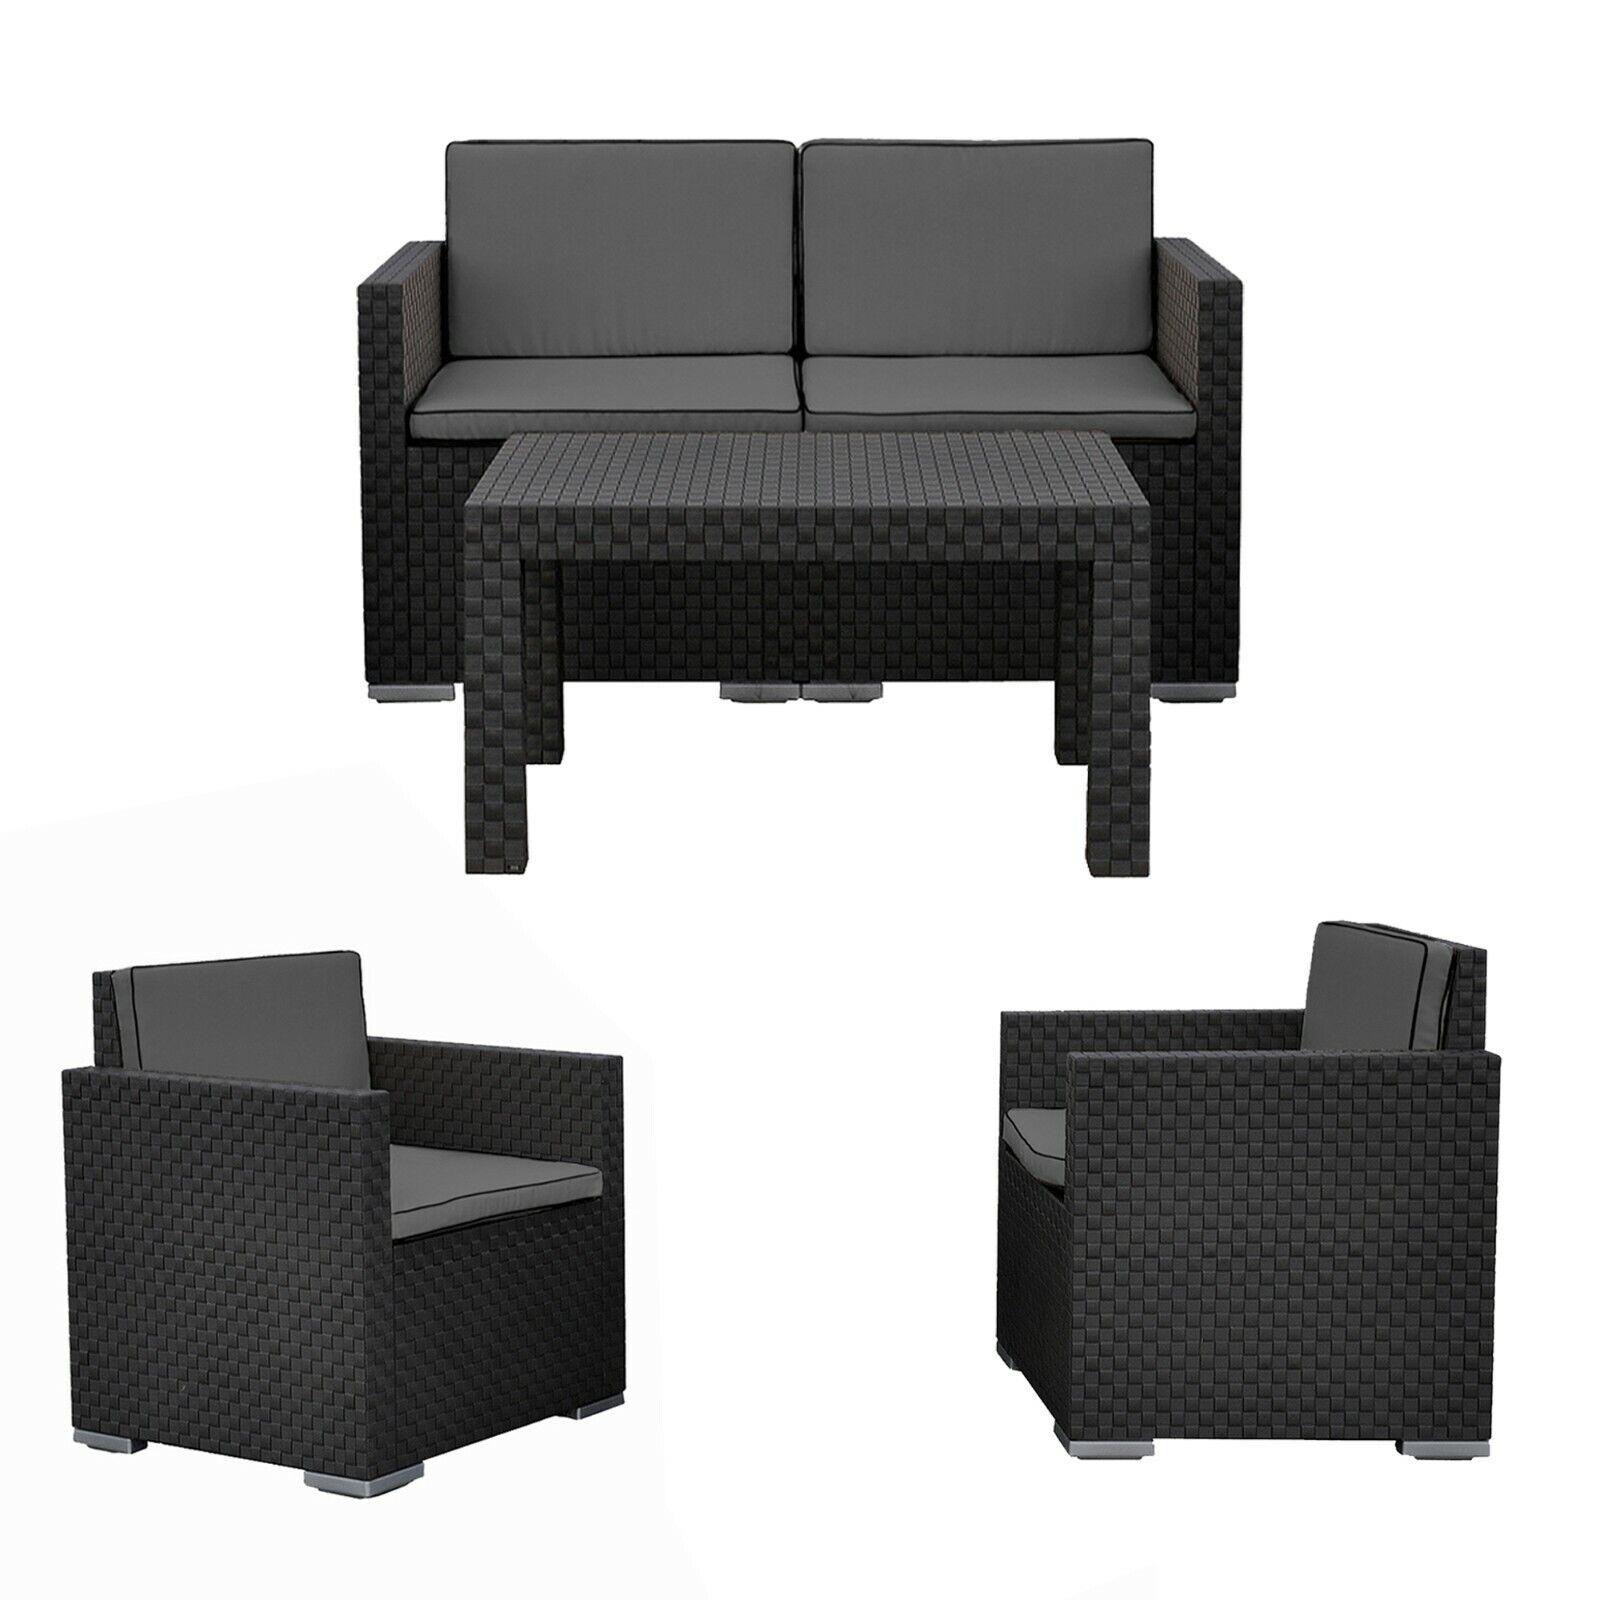 Garden Furniture - 4 Pc Black Lounge Garden Furniture Patio Rattan Design Conversation Set Cushions